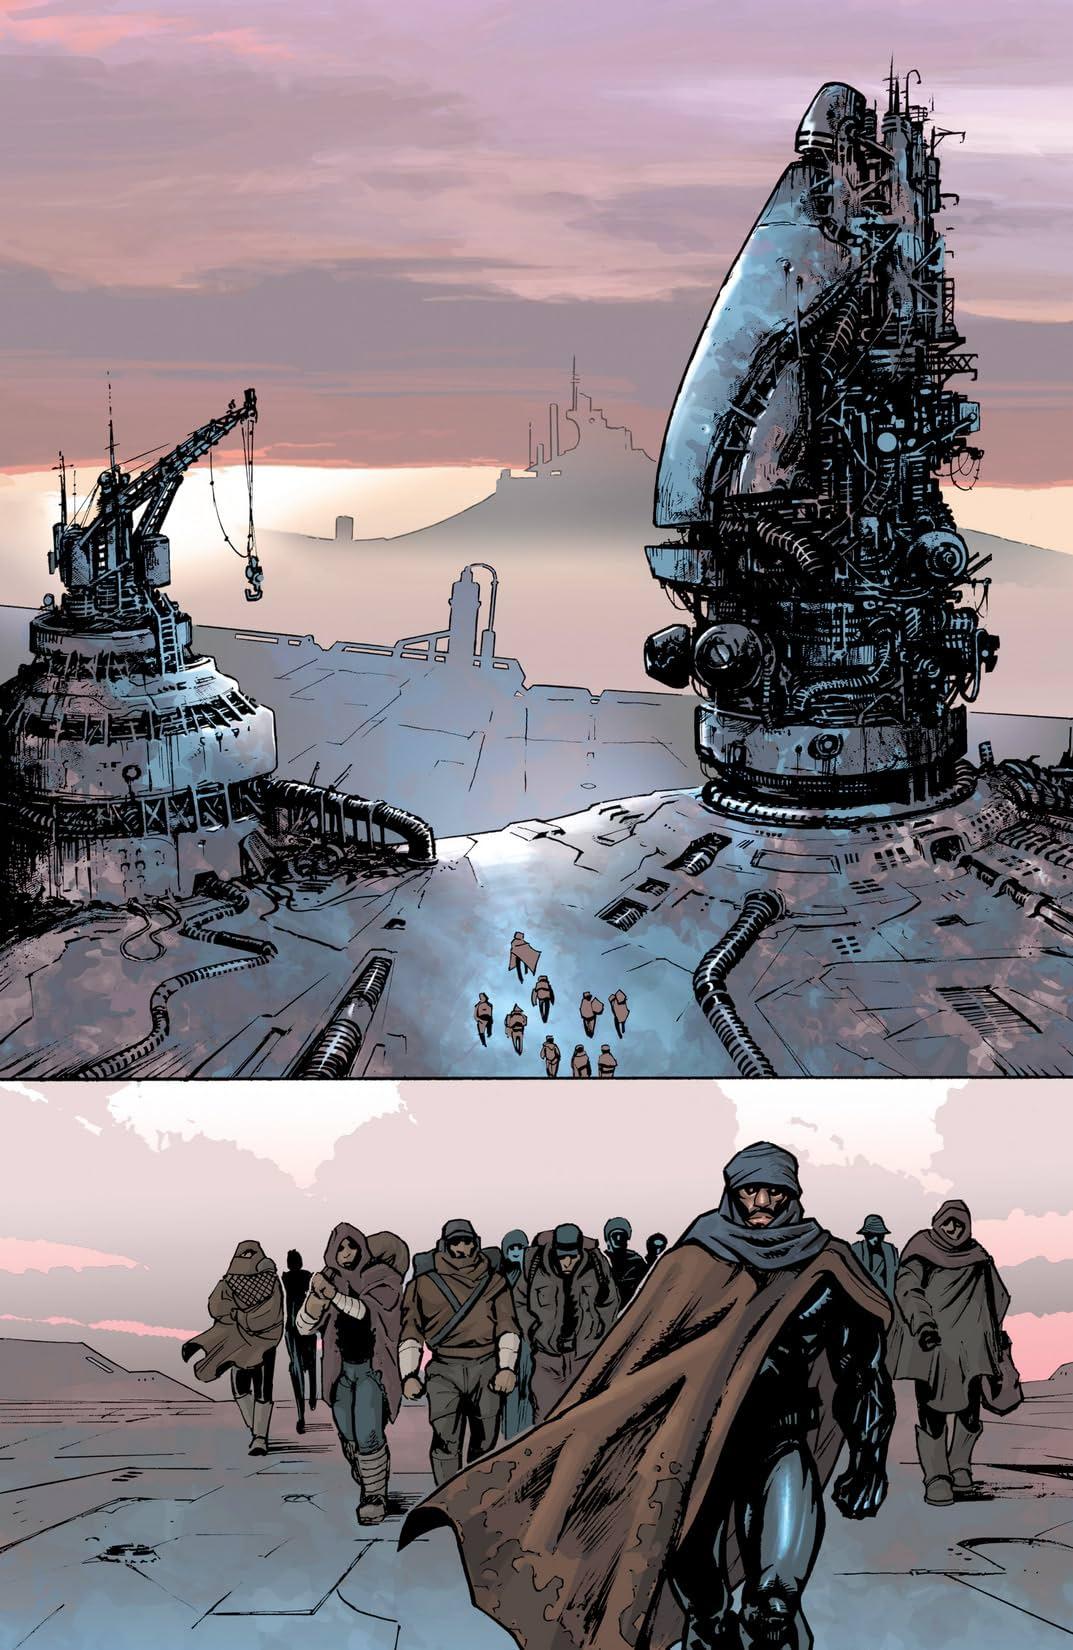 Planetoid #2